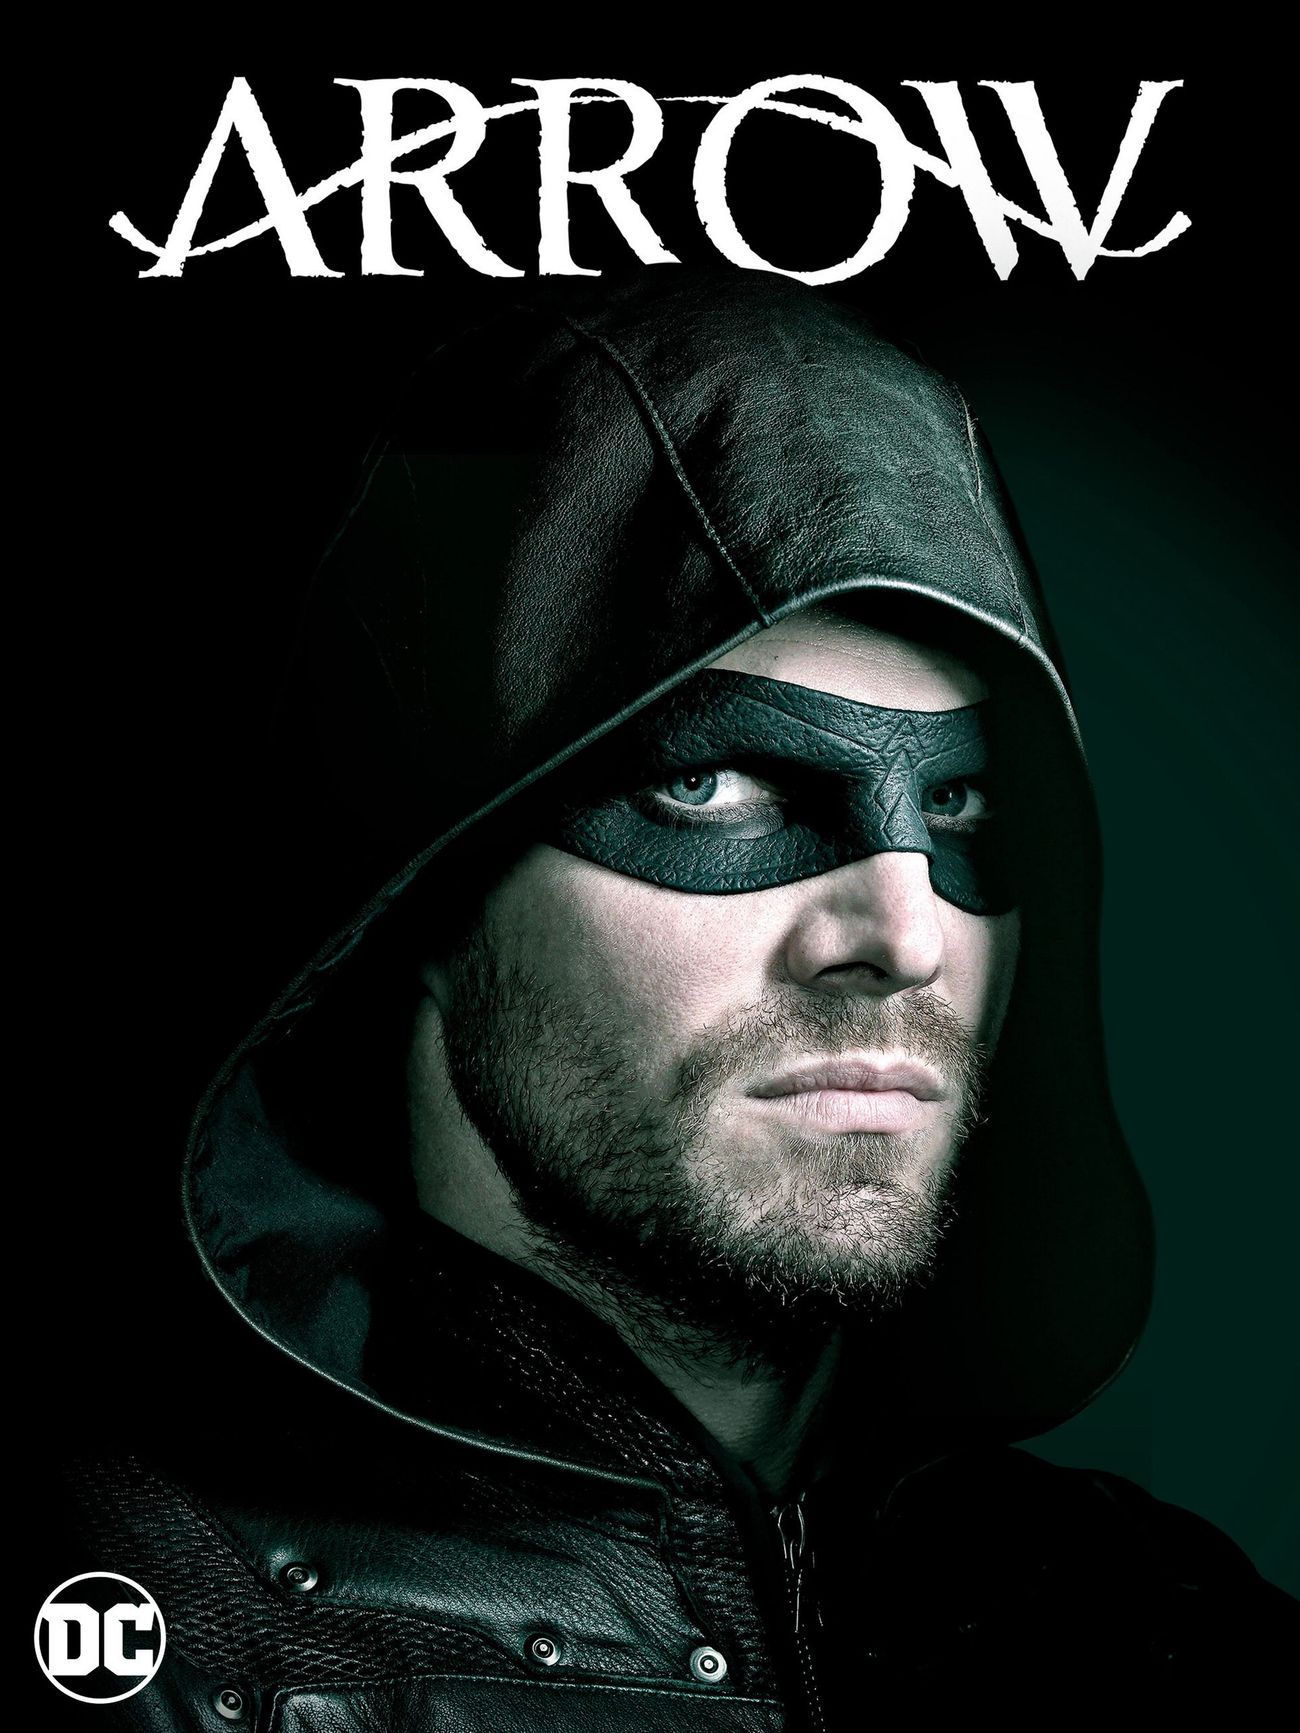 Dynamic Wallpaper Iphone X Arrow Season 6 Poster Oliverqueen Green Arrow In 2018